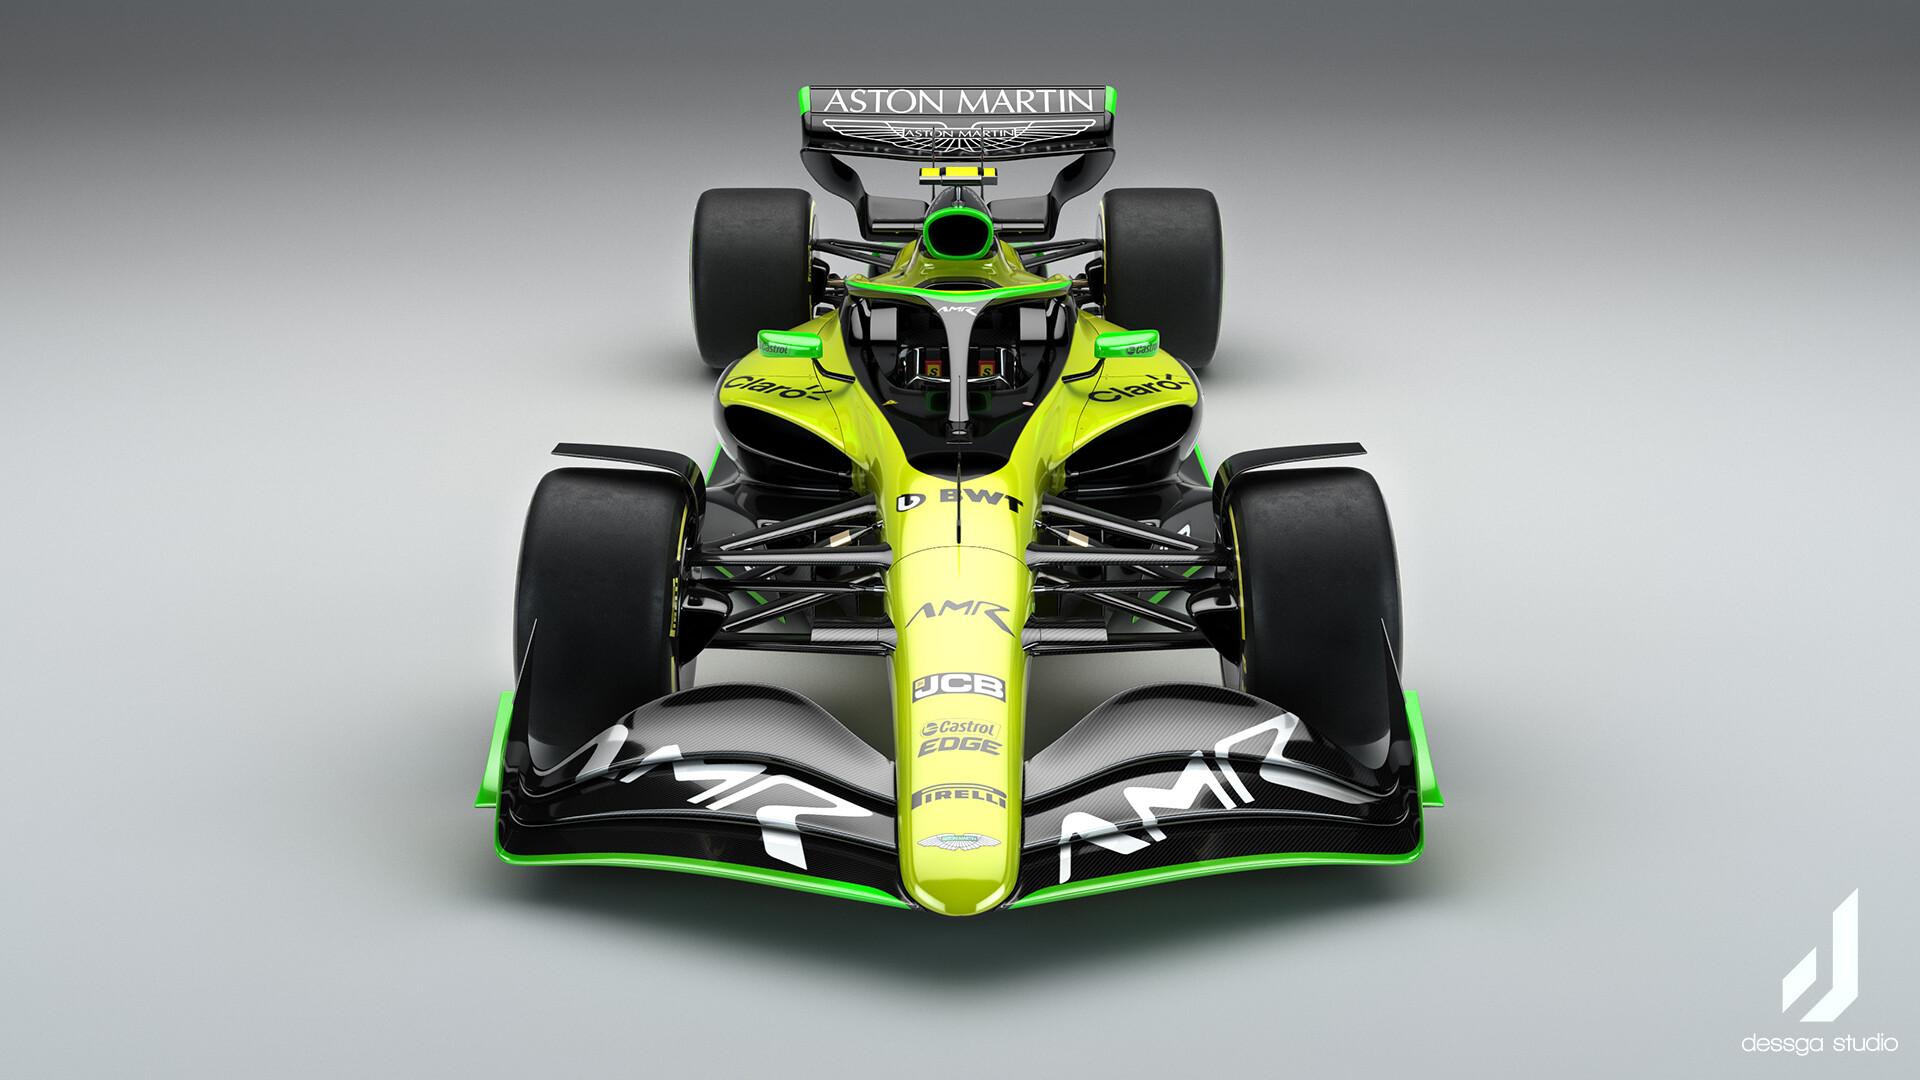 Artstation Aston Martin Formula 1 2022 Livery Concepts Dessga Arturo Garcia